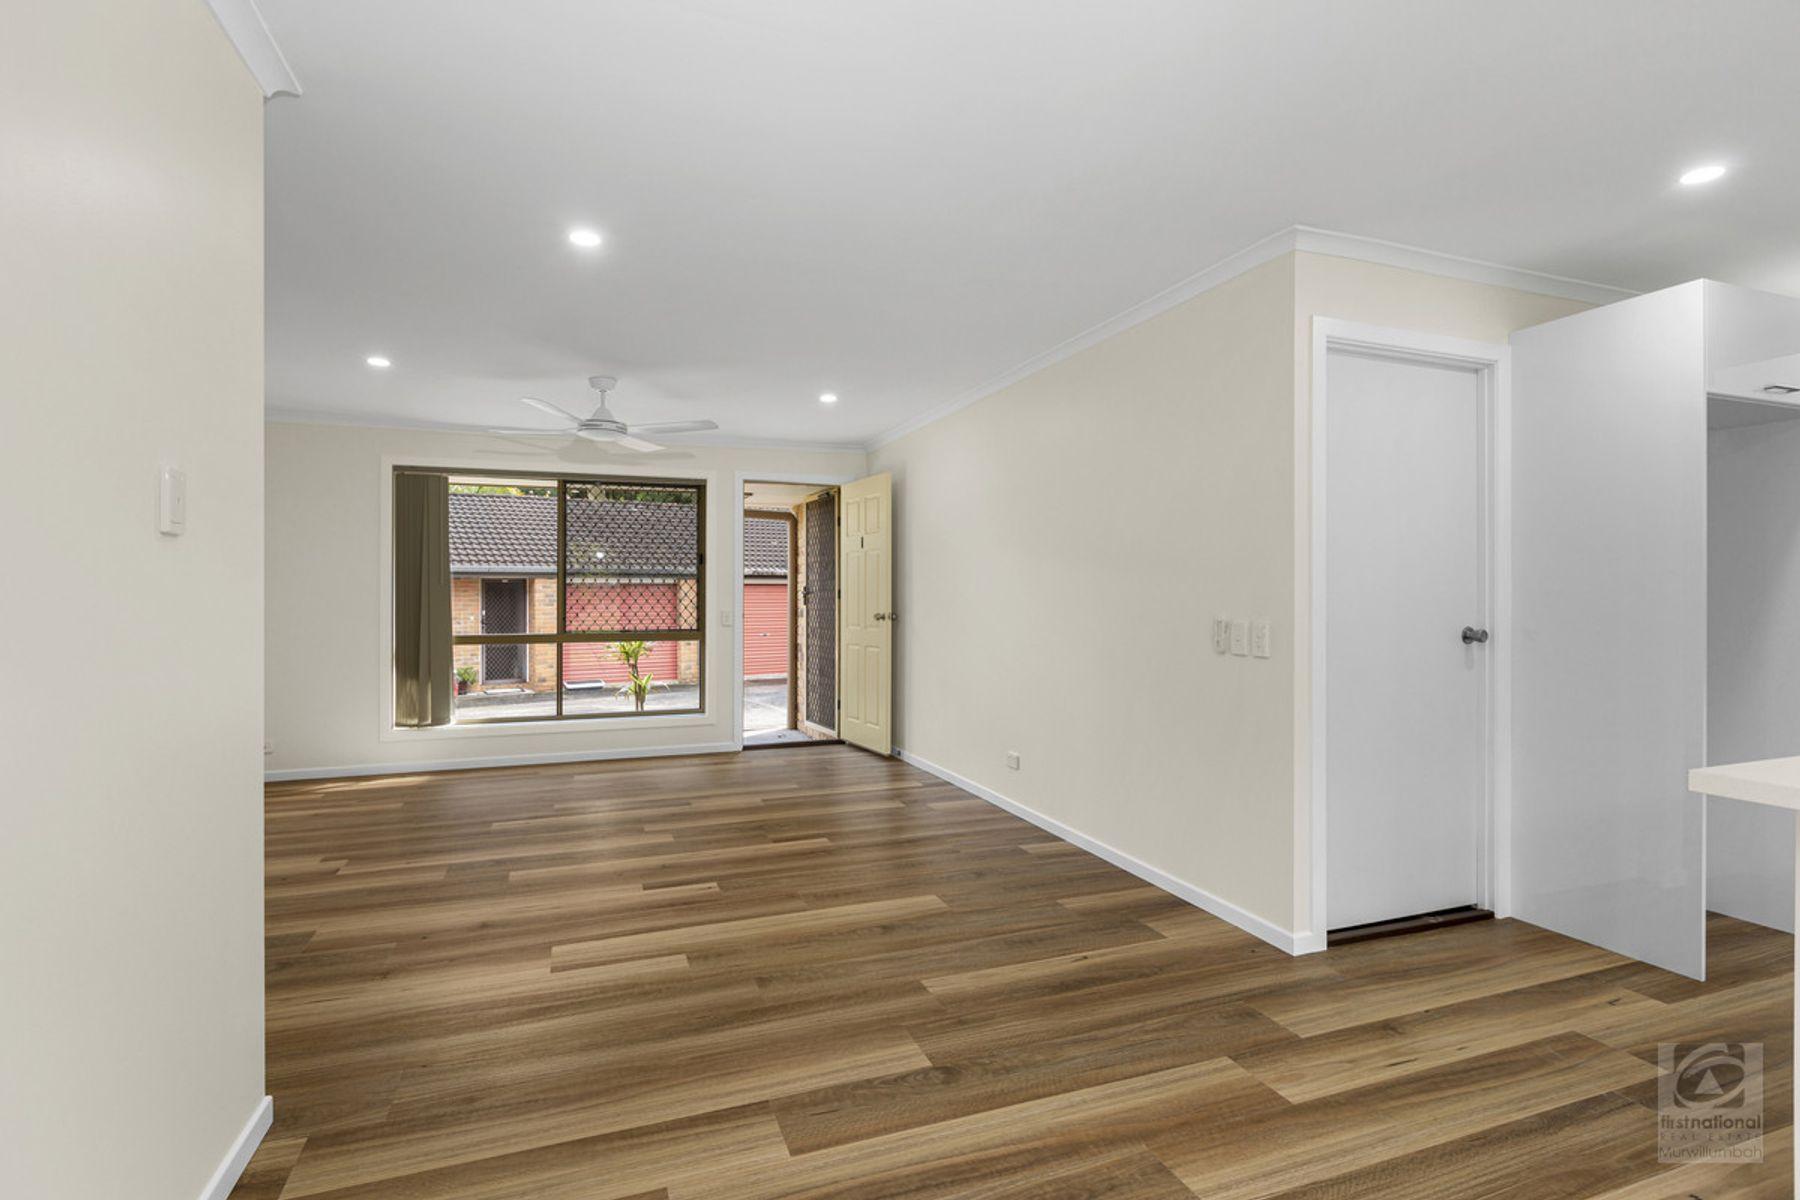 1/21 McPherson Court, Murwillumbah, NSW 2484